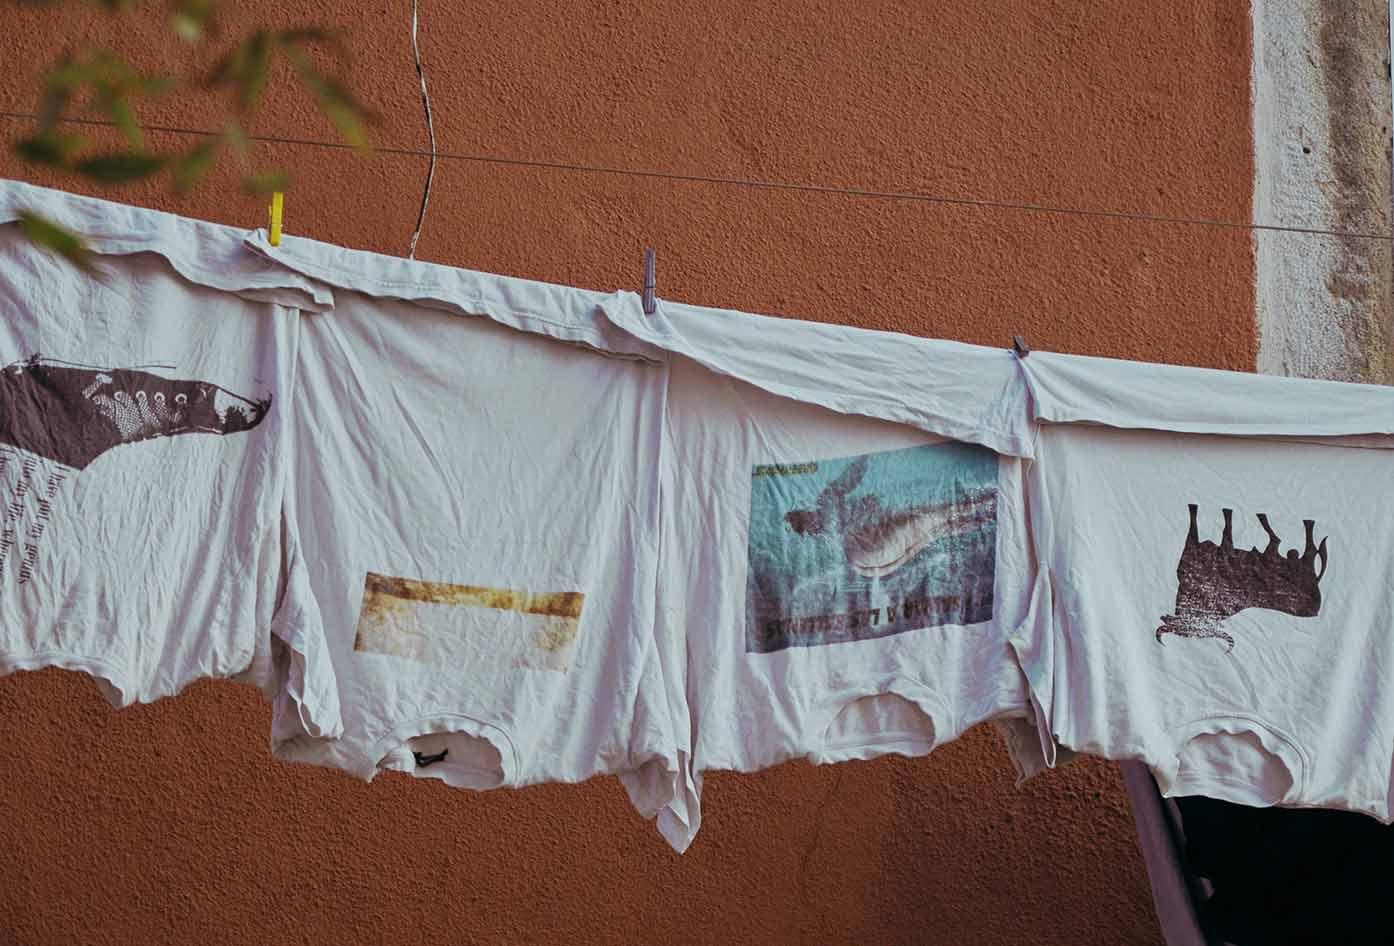 travel laundry detergent